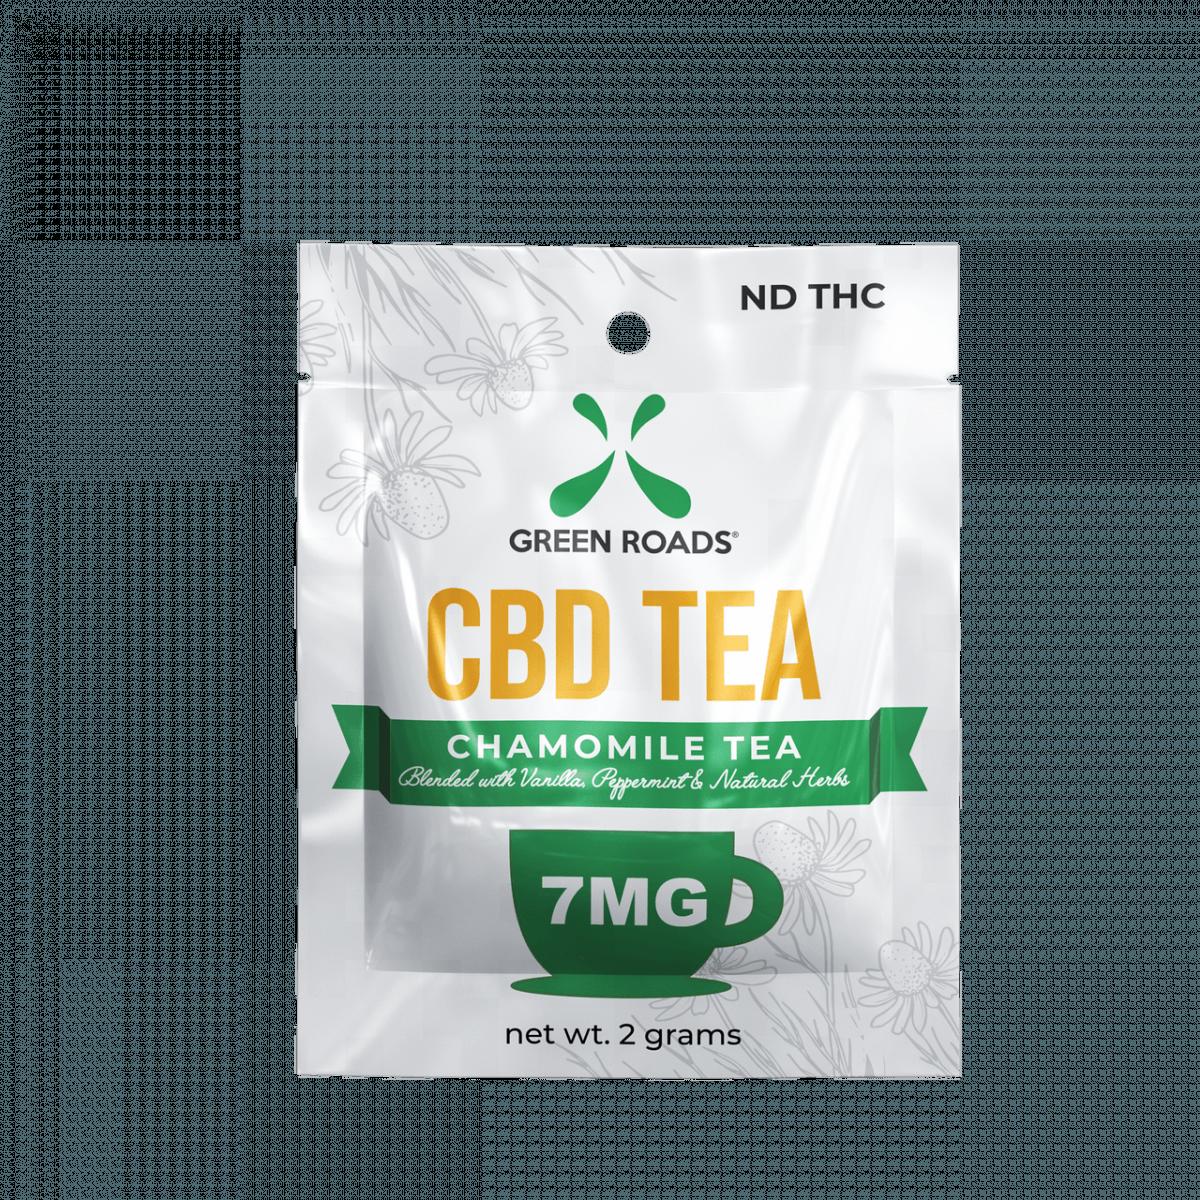 Green Roads CBD Tea Chamomile